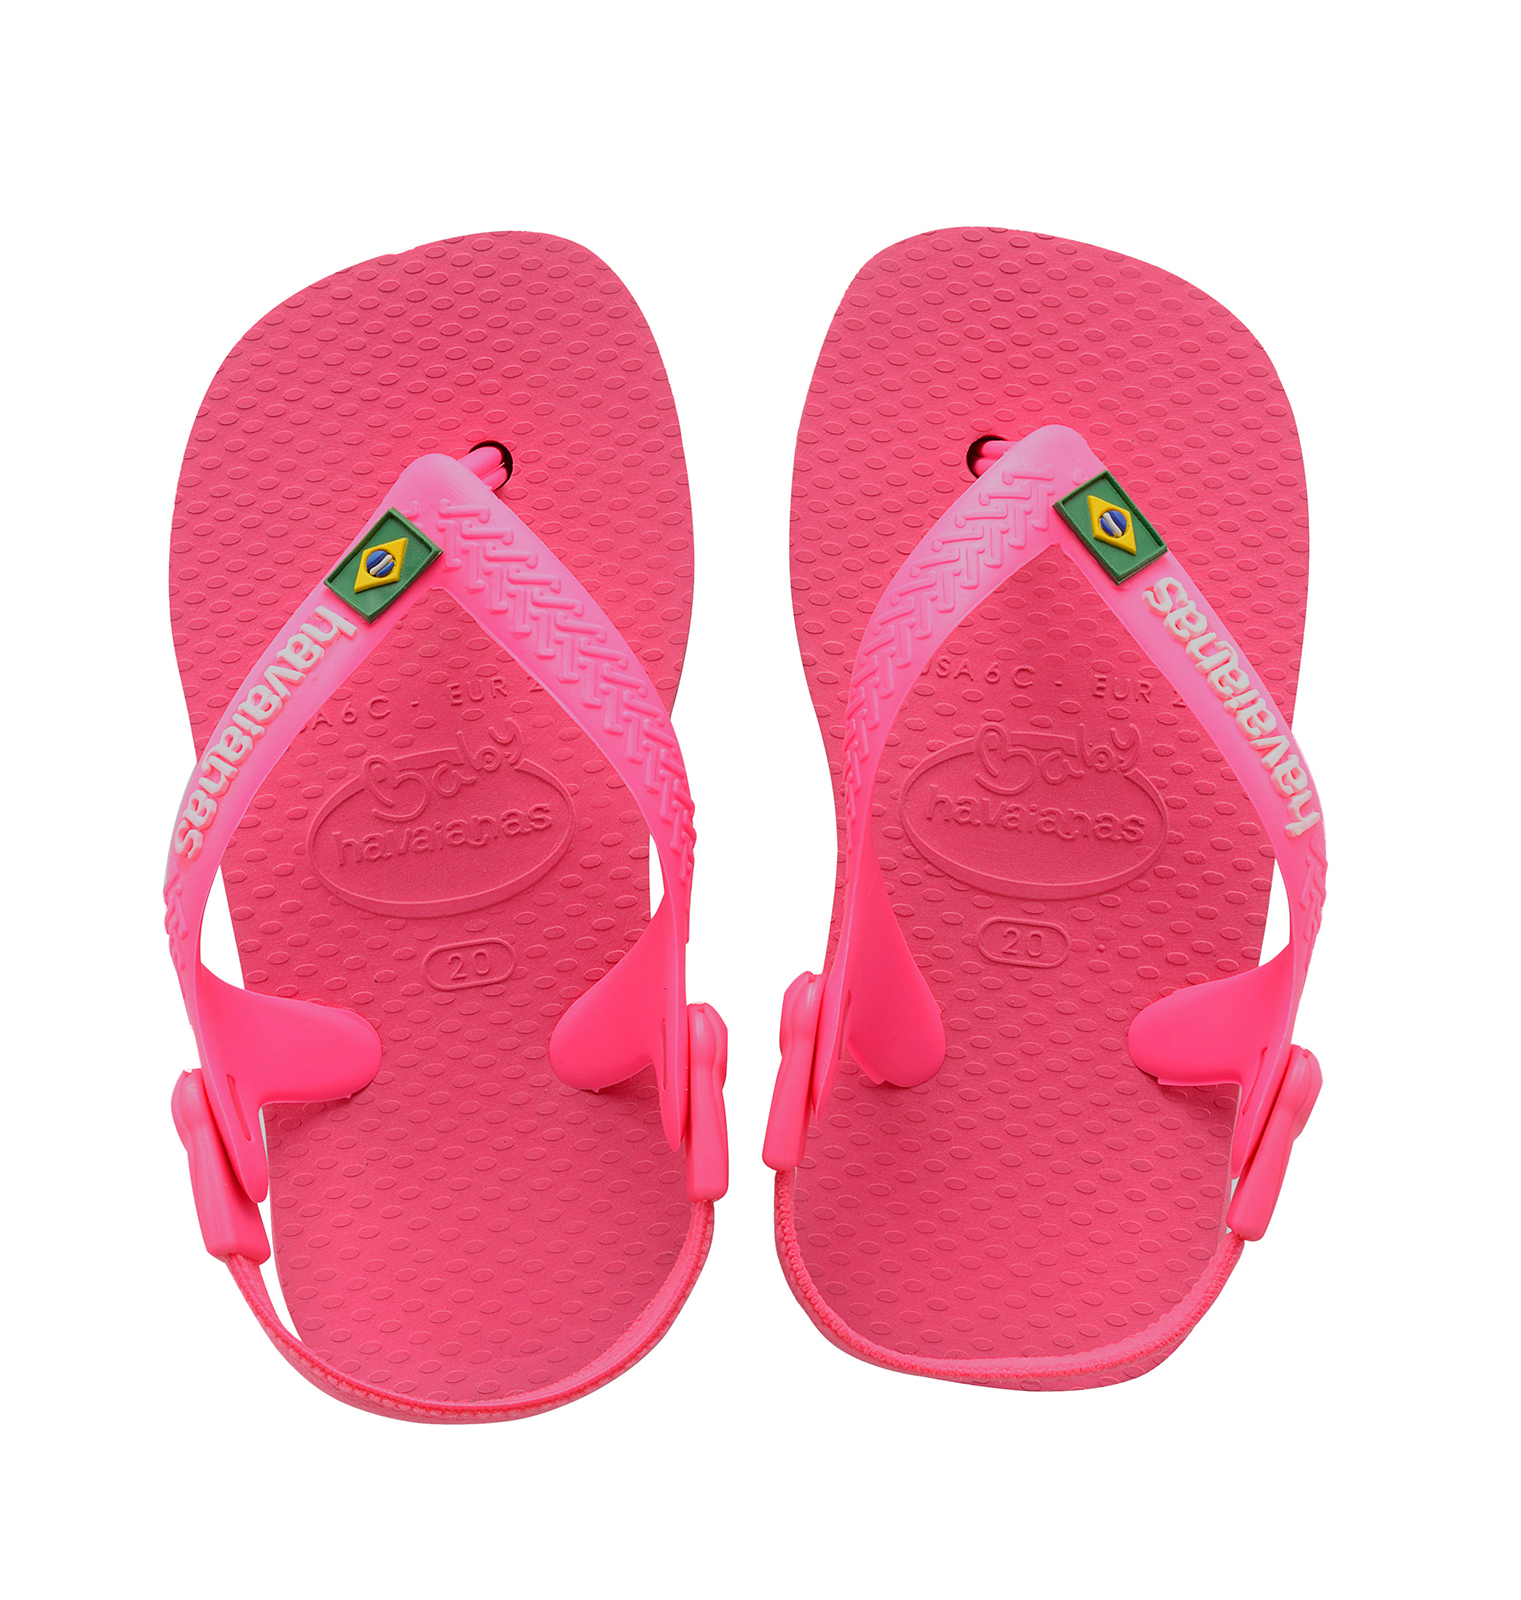 4292483a13d9 ... Pink Havaianas sandal flip flops for babies - Baby Brasil Logo Shocking  Pink ...